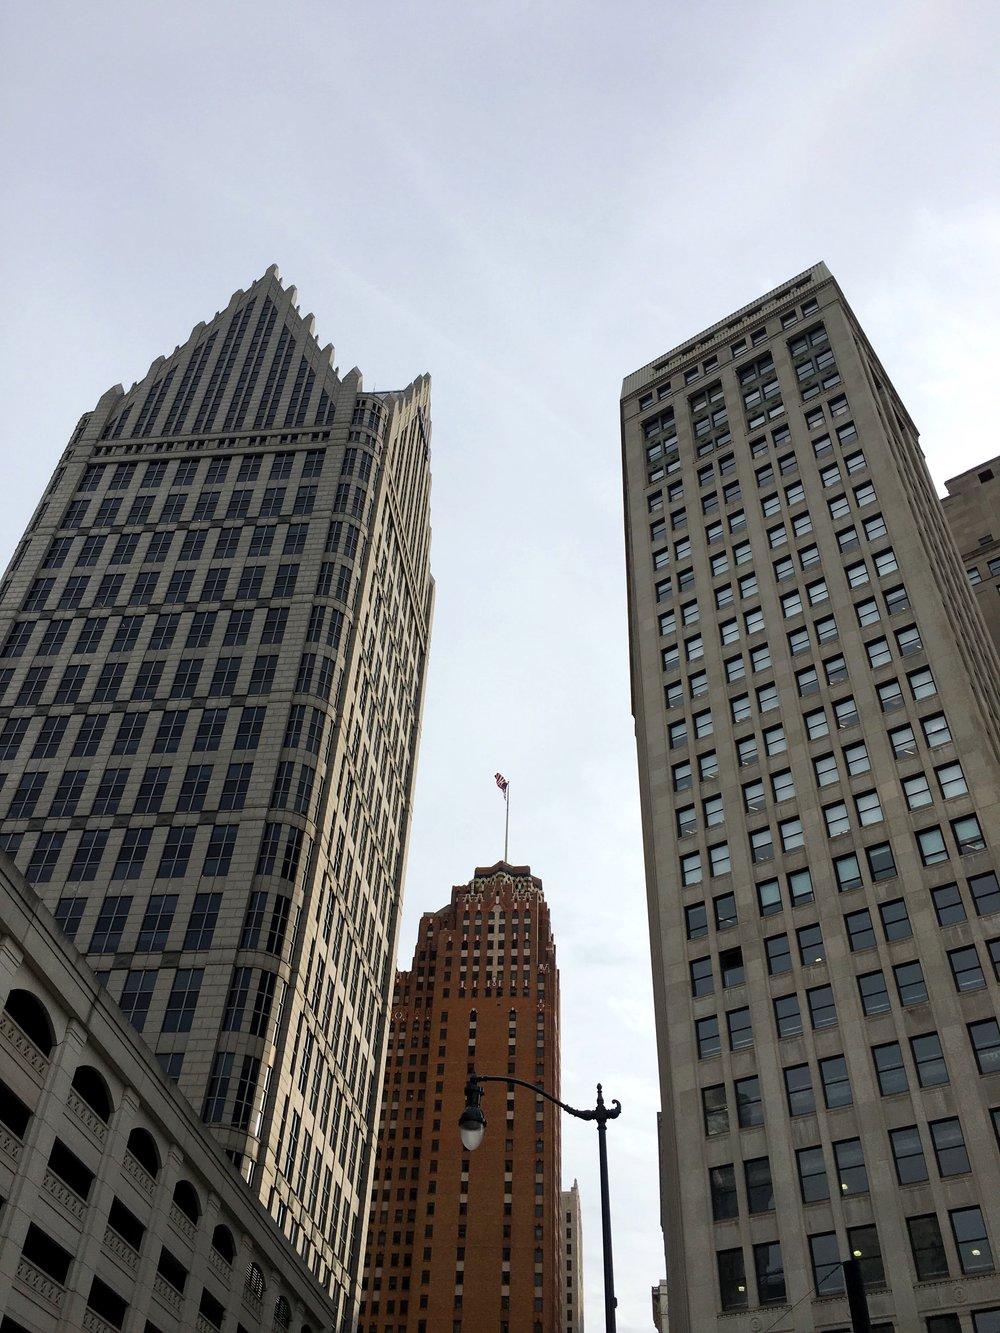 Michigan Sights / Downtown Detroit, Michigan / City / Sky Scraper